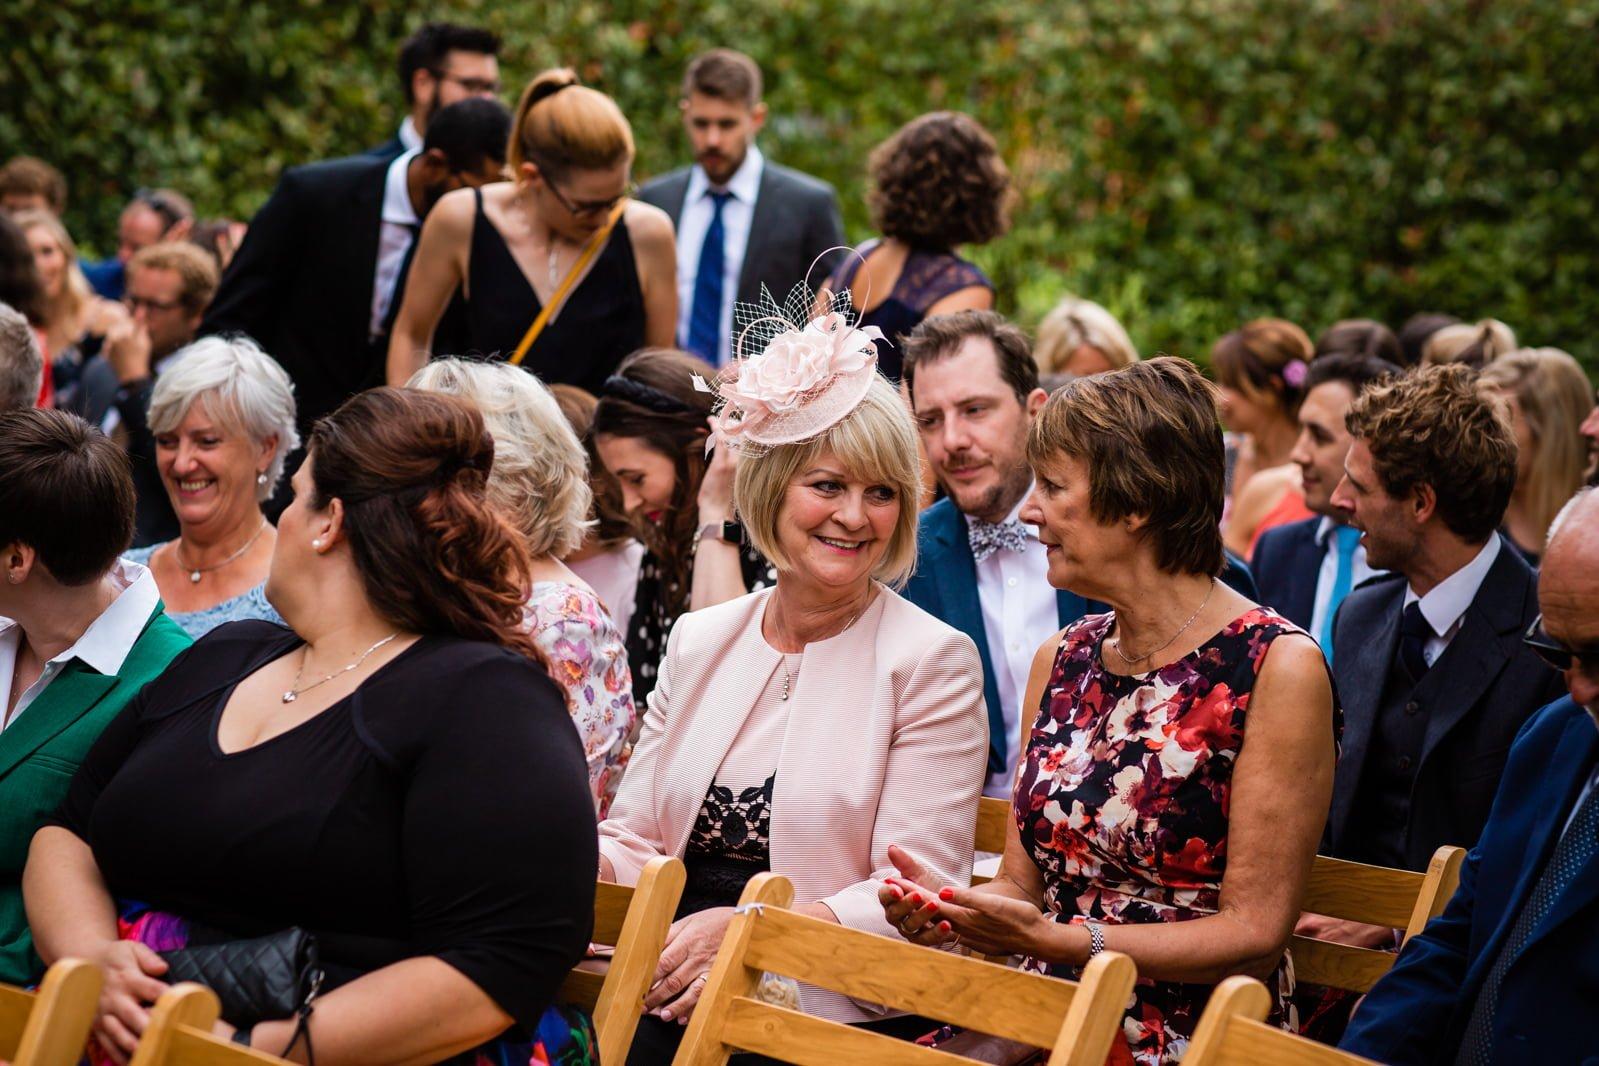 Millbridge Court Wedding - stunning summer wedding - wedding photography 42